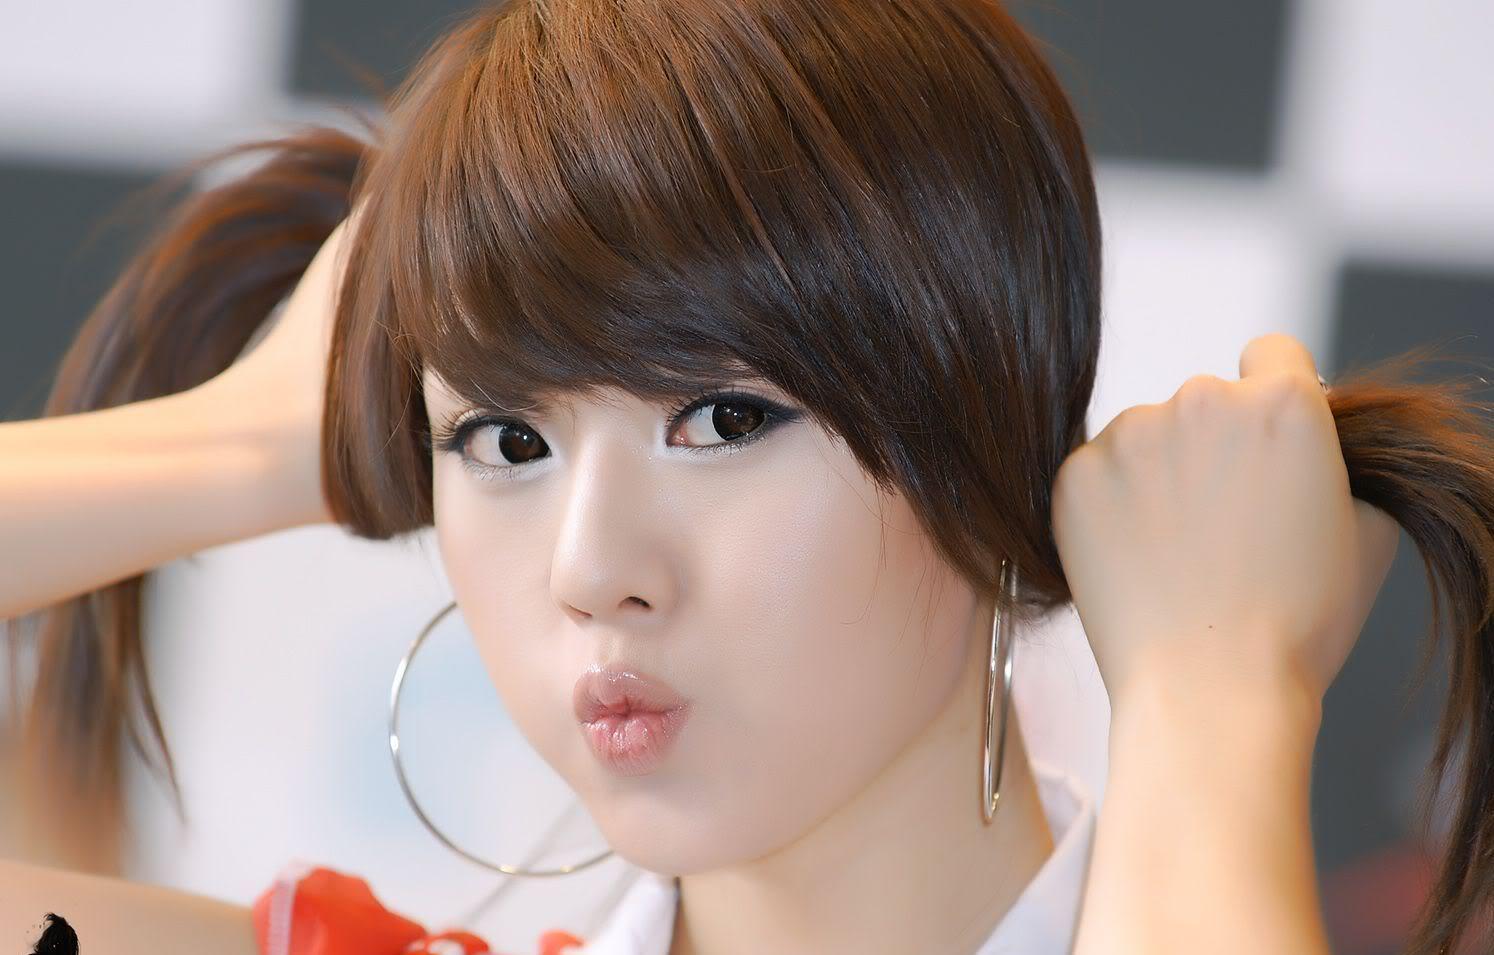 بالصور بنات كوريات كشخه , اجمل صور لبنات كوريا 2105 6